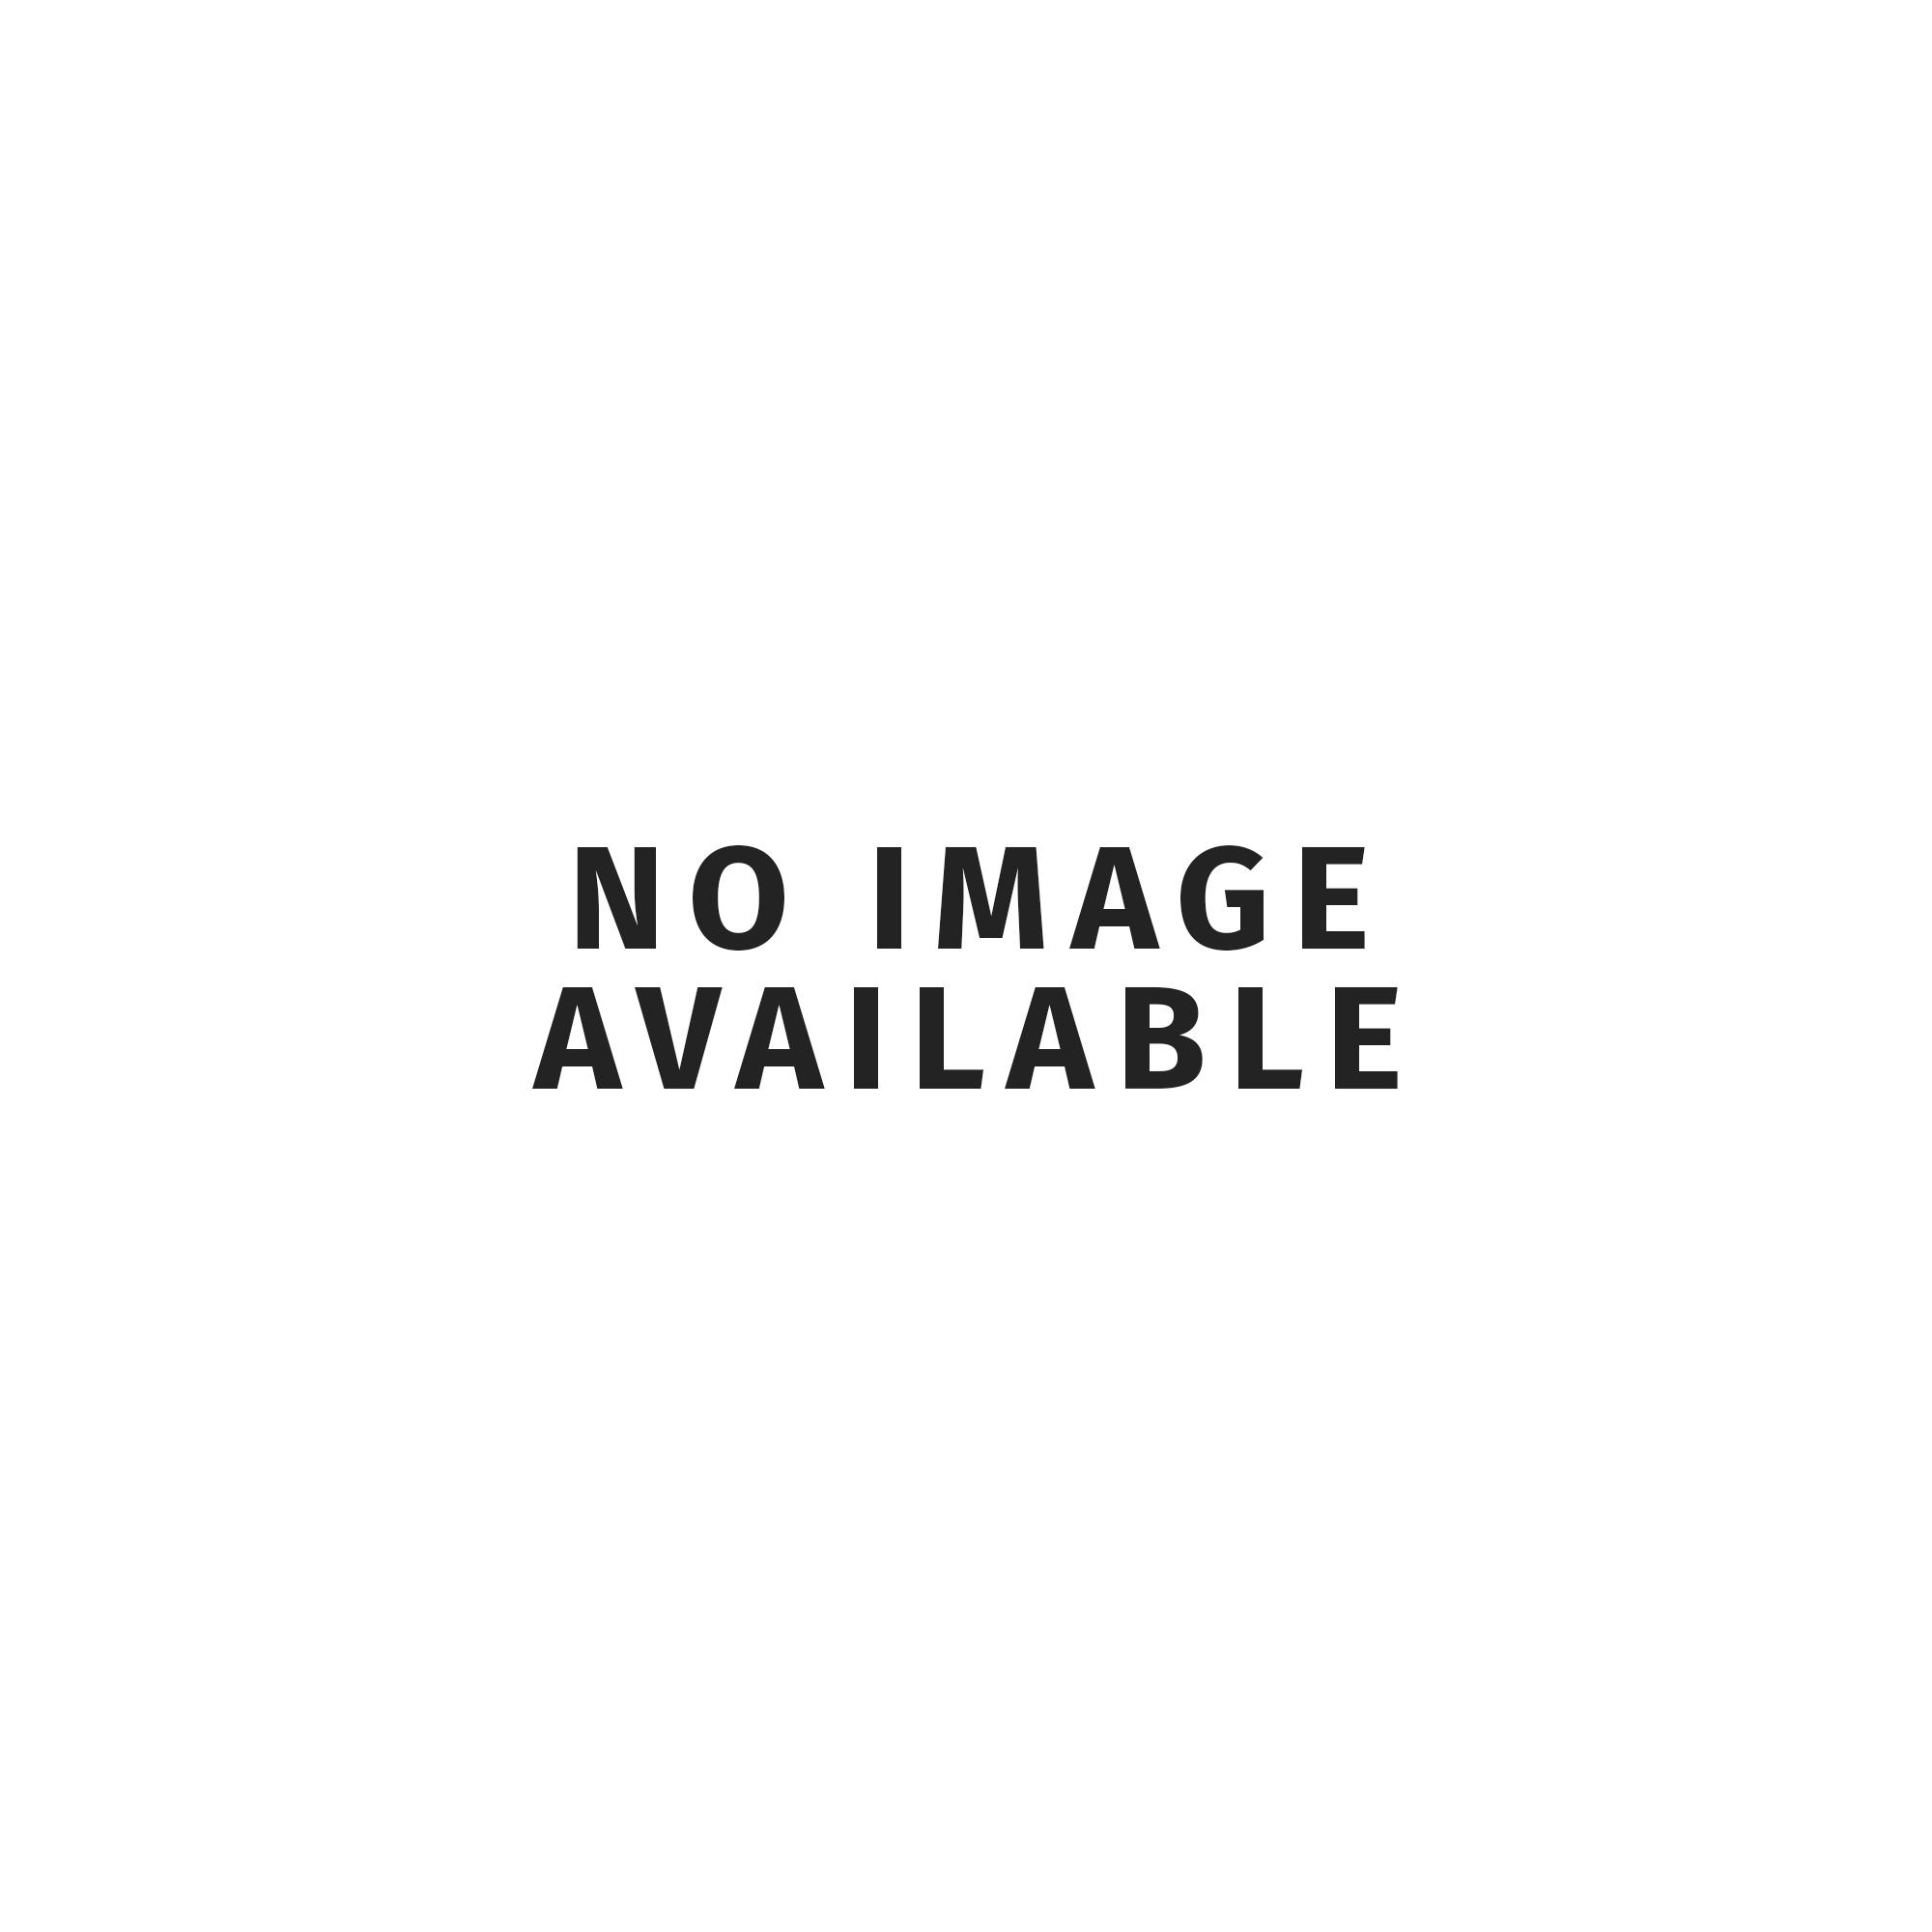 Xposure Skull Grips 2013